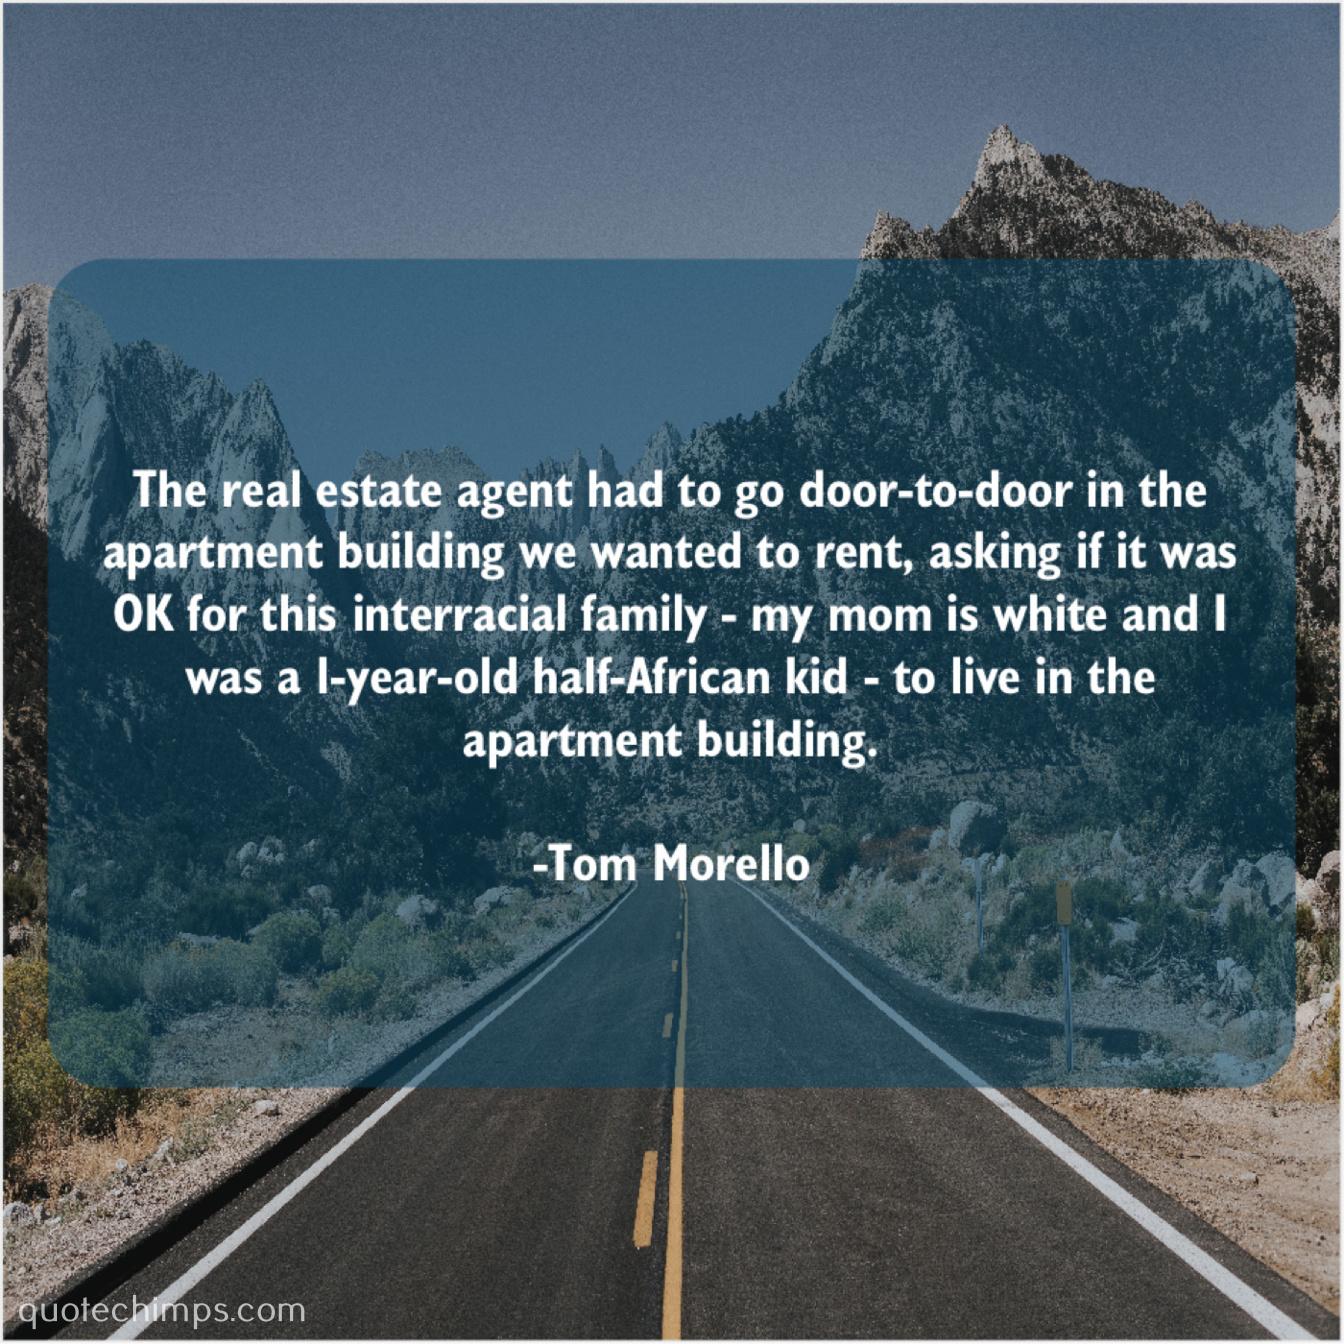 Tom Morello – The real estate agent had… – Quote Chimps